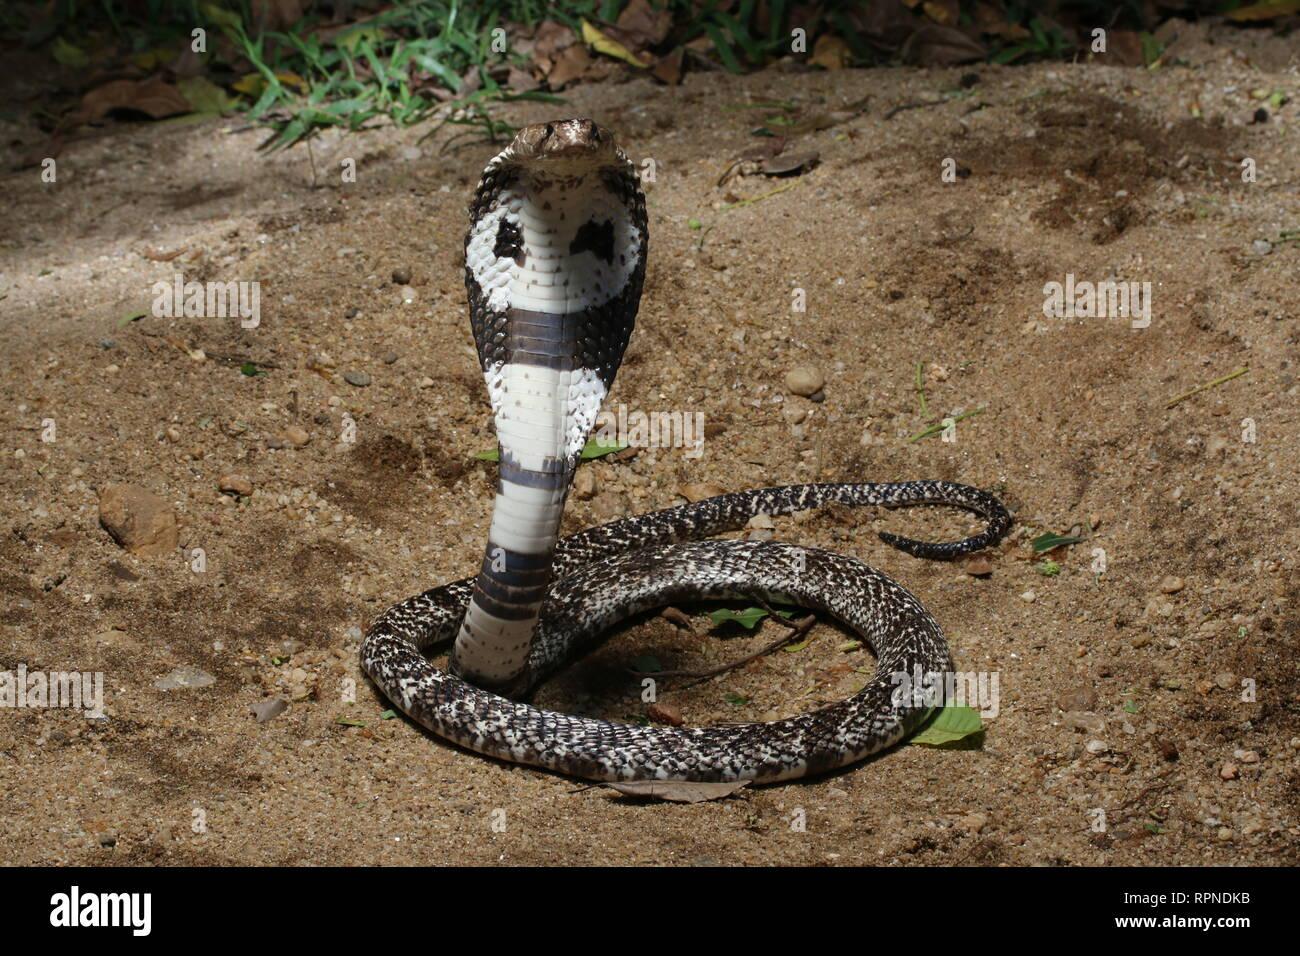 La Cobra india (Naja naja) Foto de stock